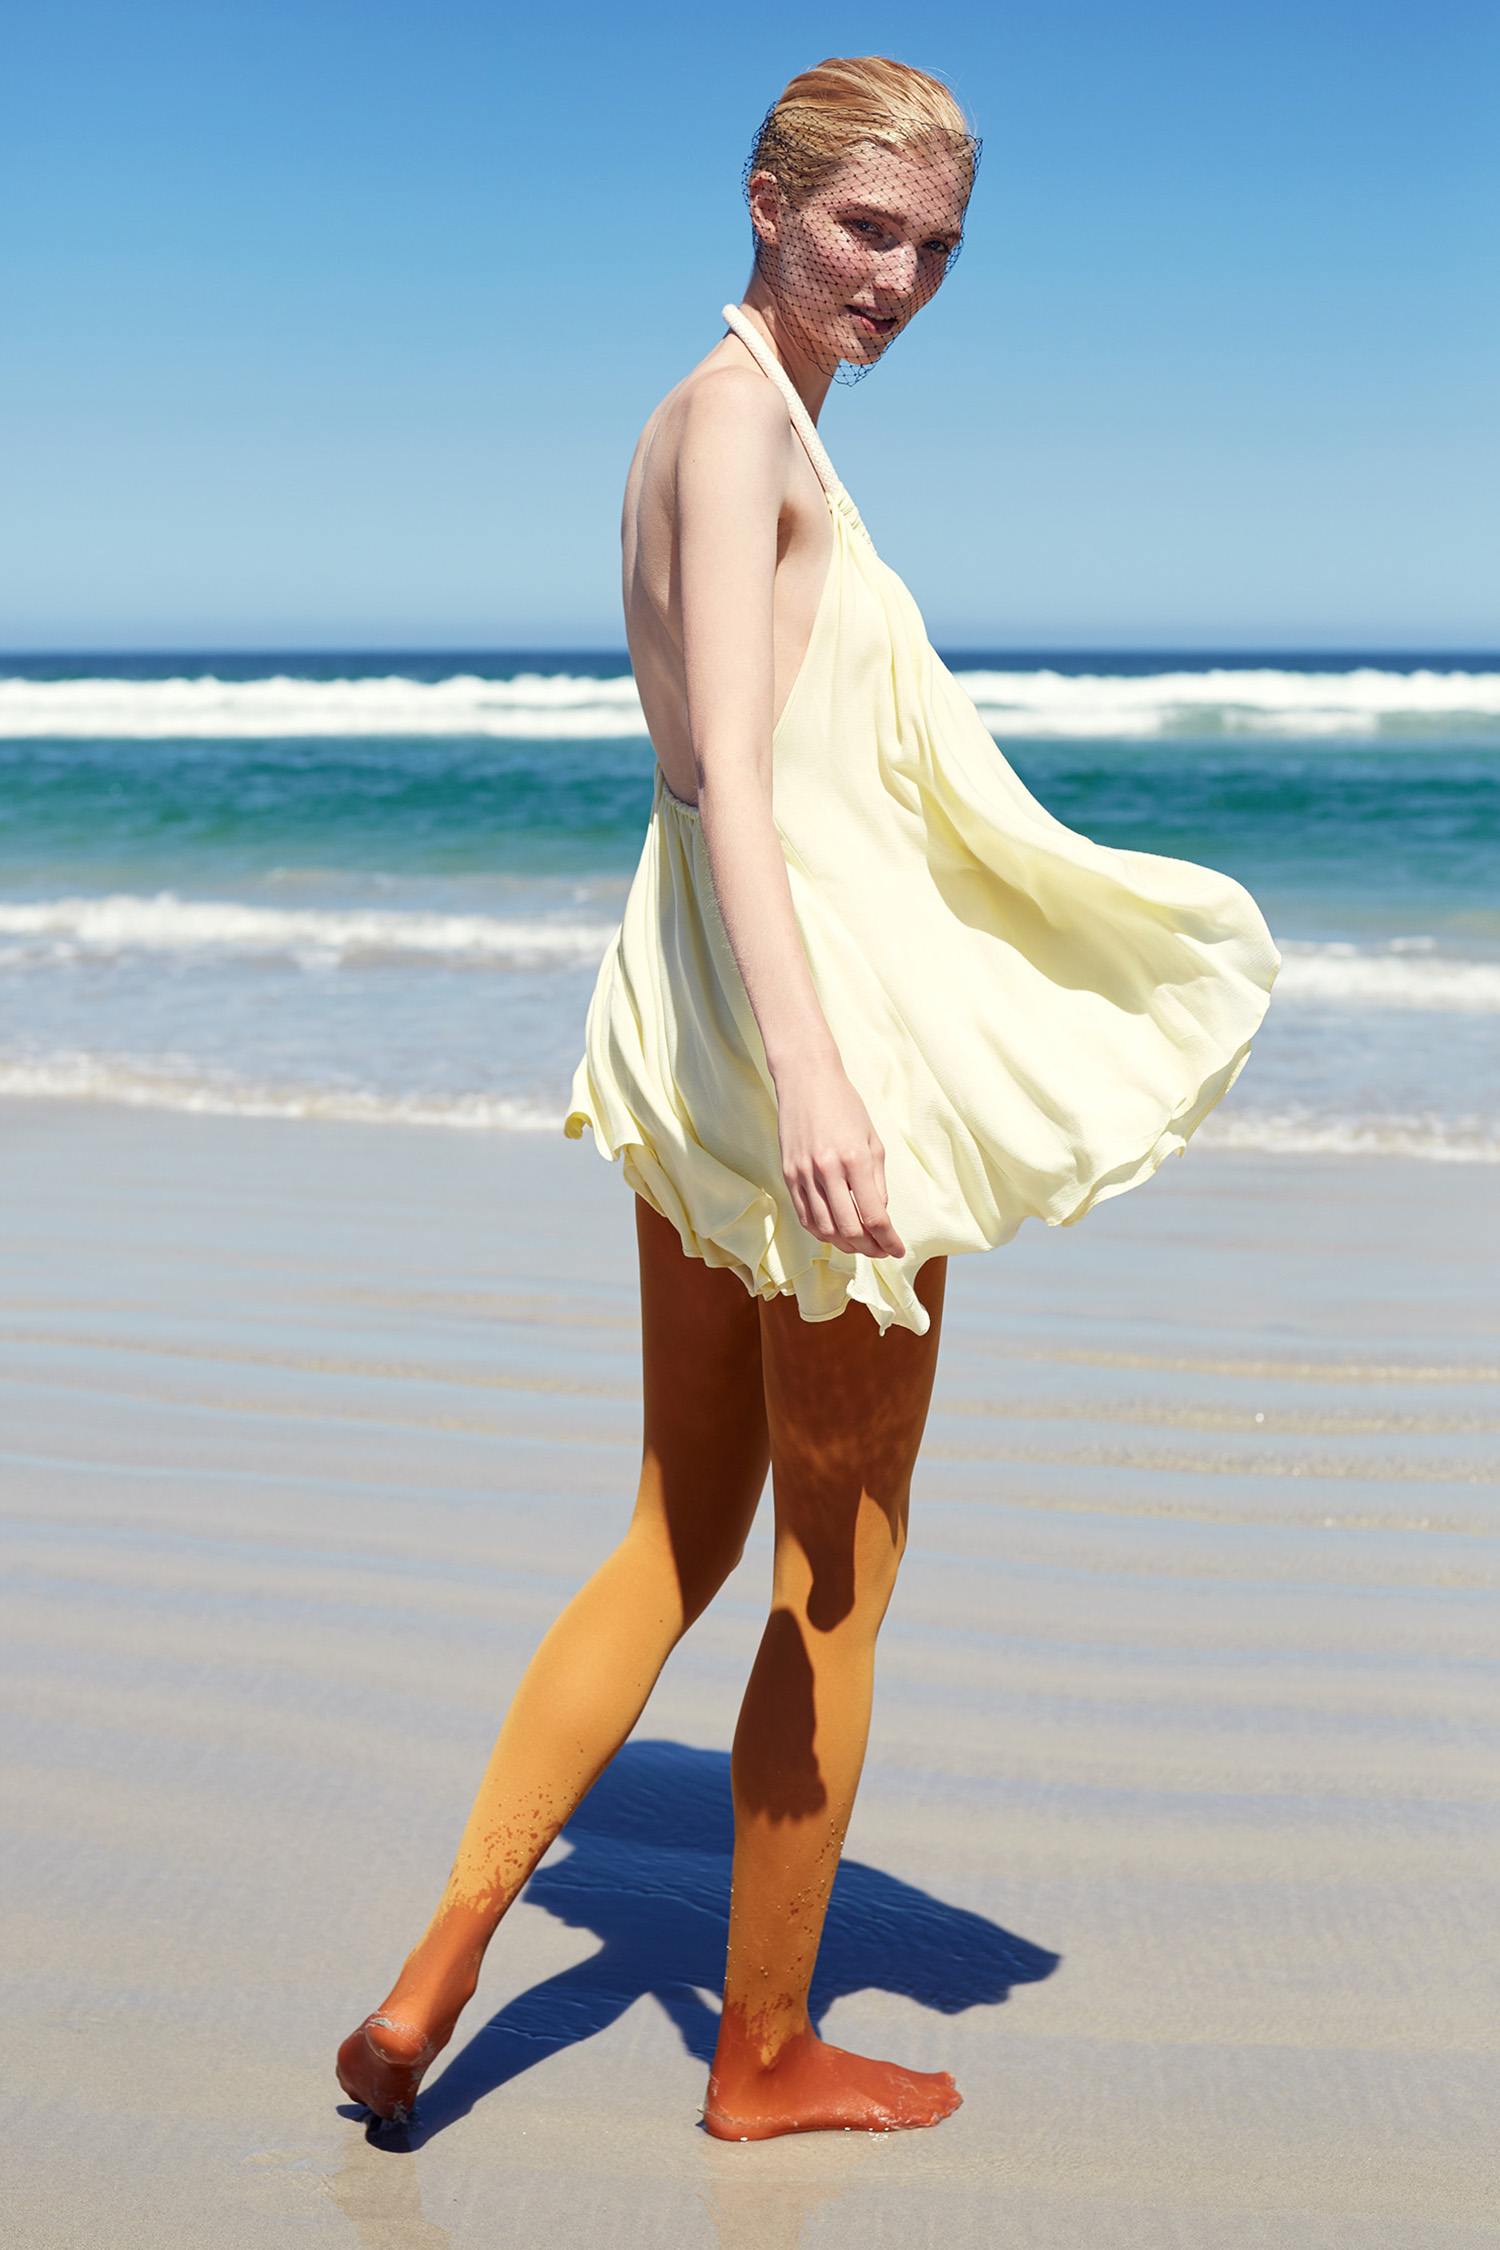 Top,PICHULIK; stockings,Calzedonia